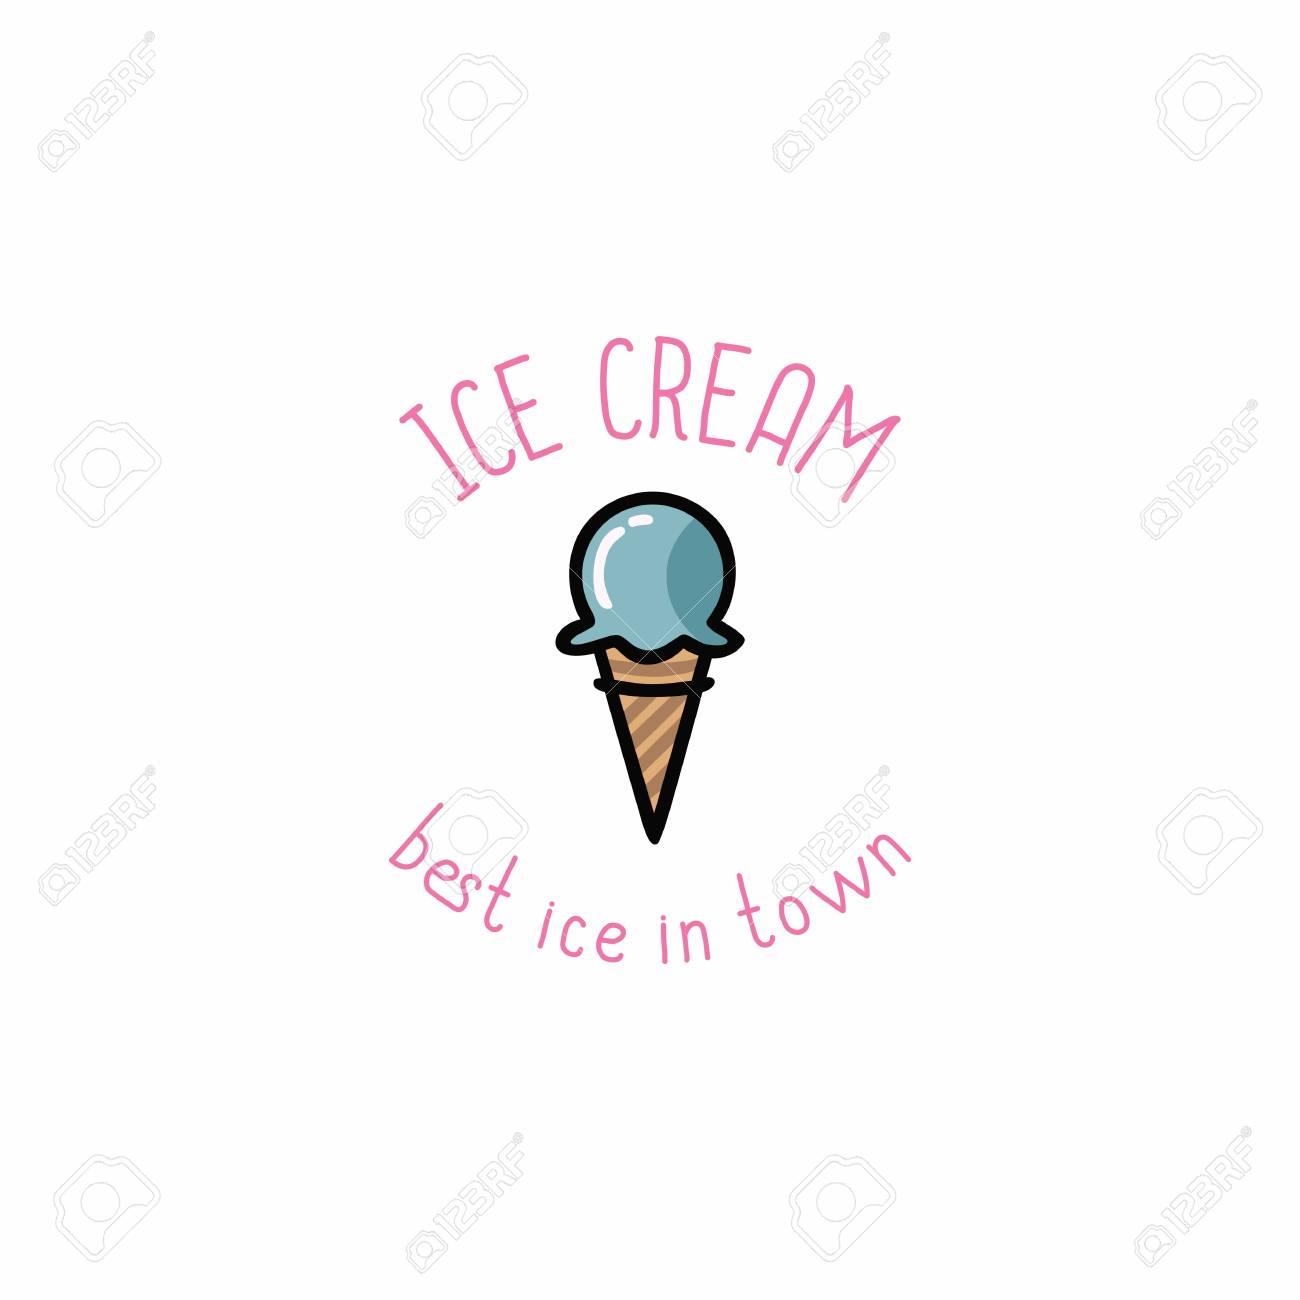 Ice Cream Logo Vector Design Template Royalty Free Cliparts ...